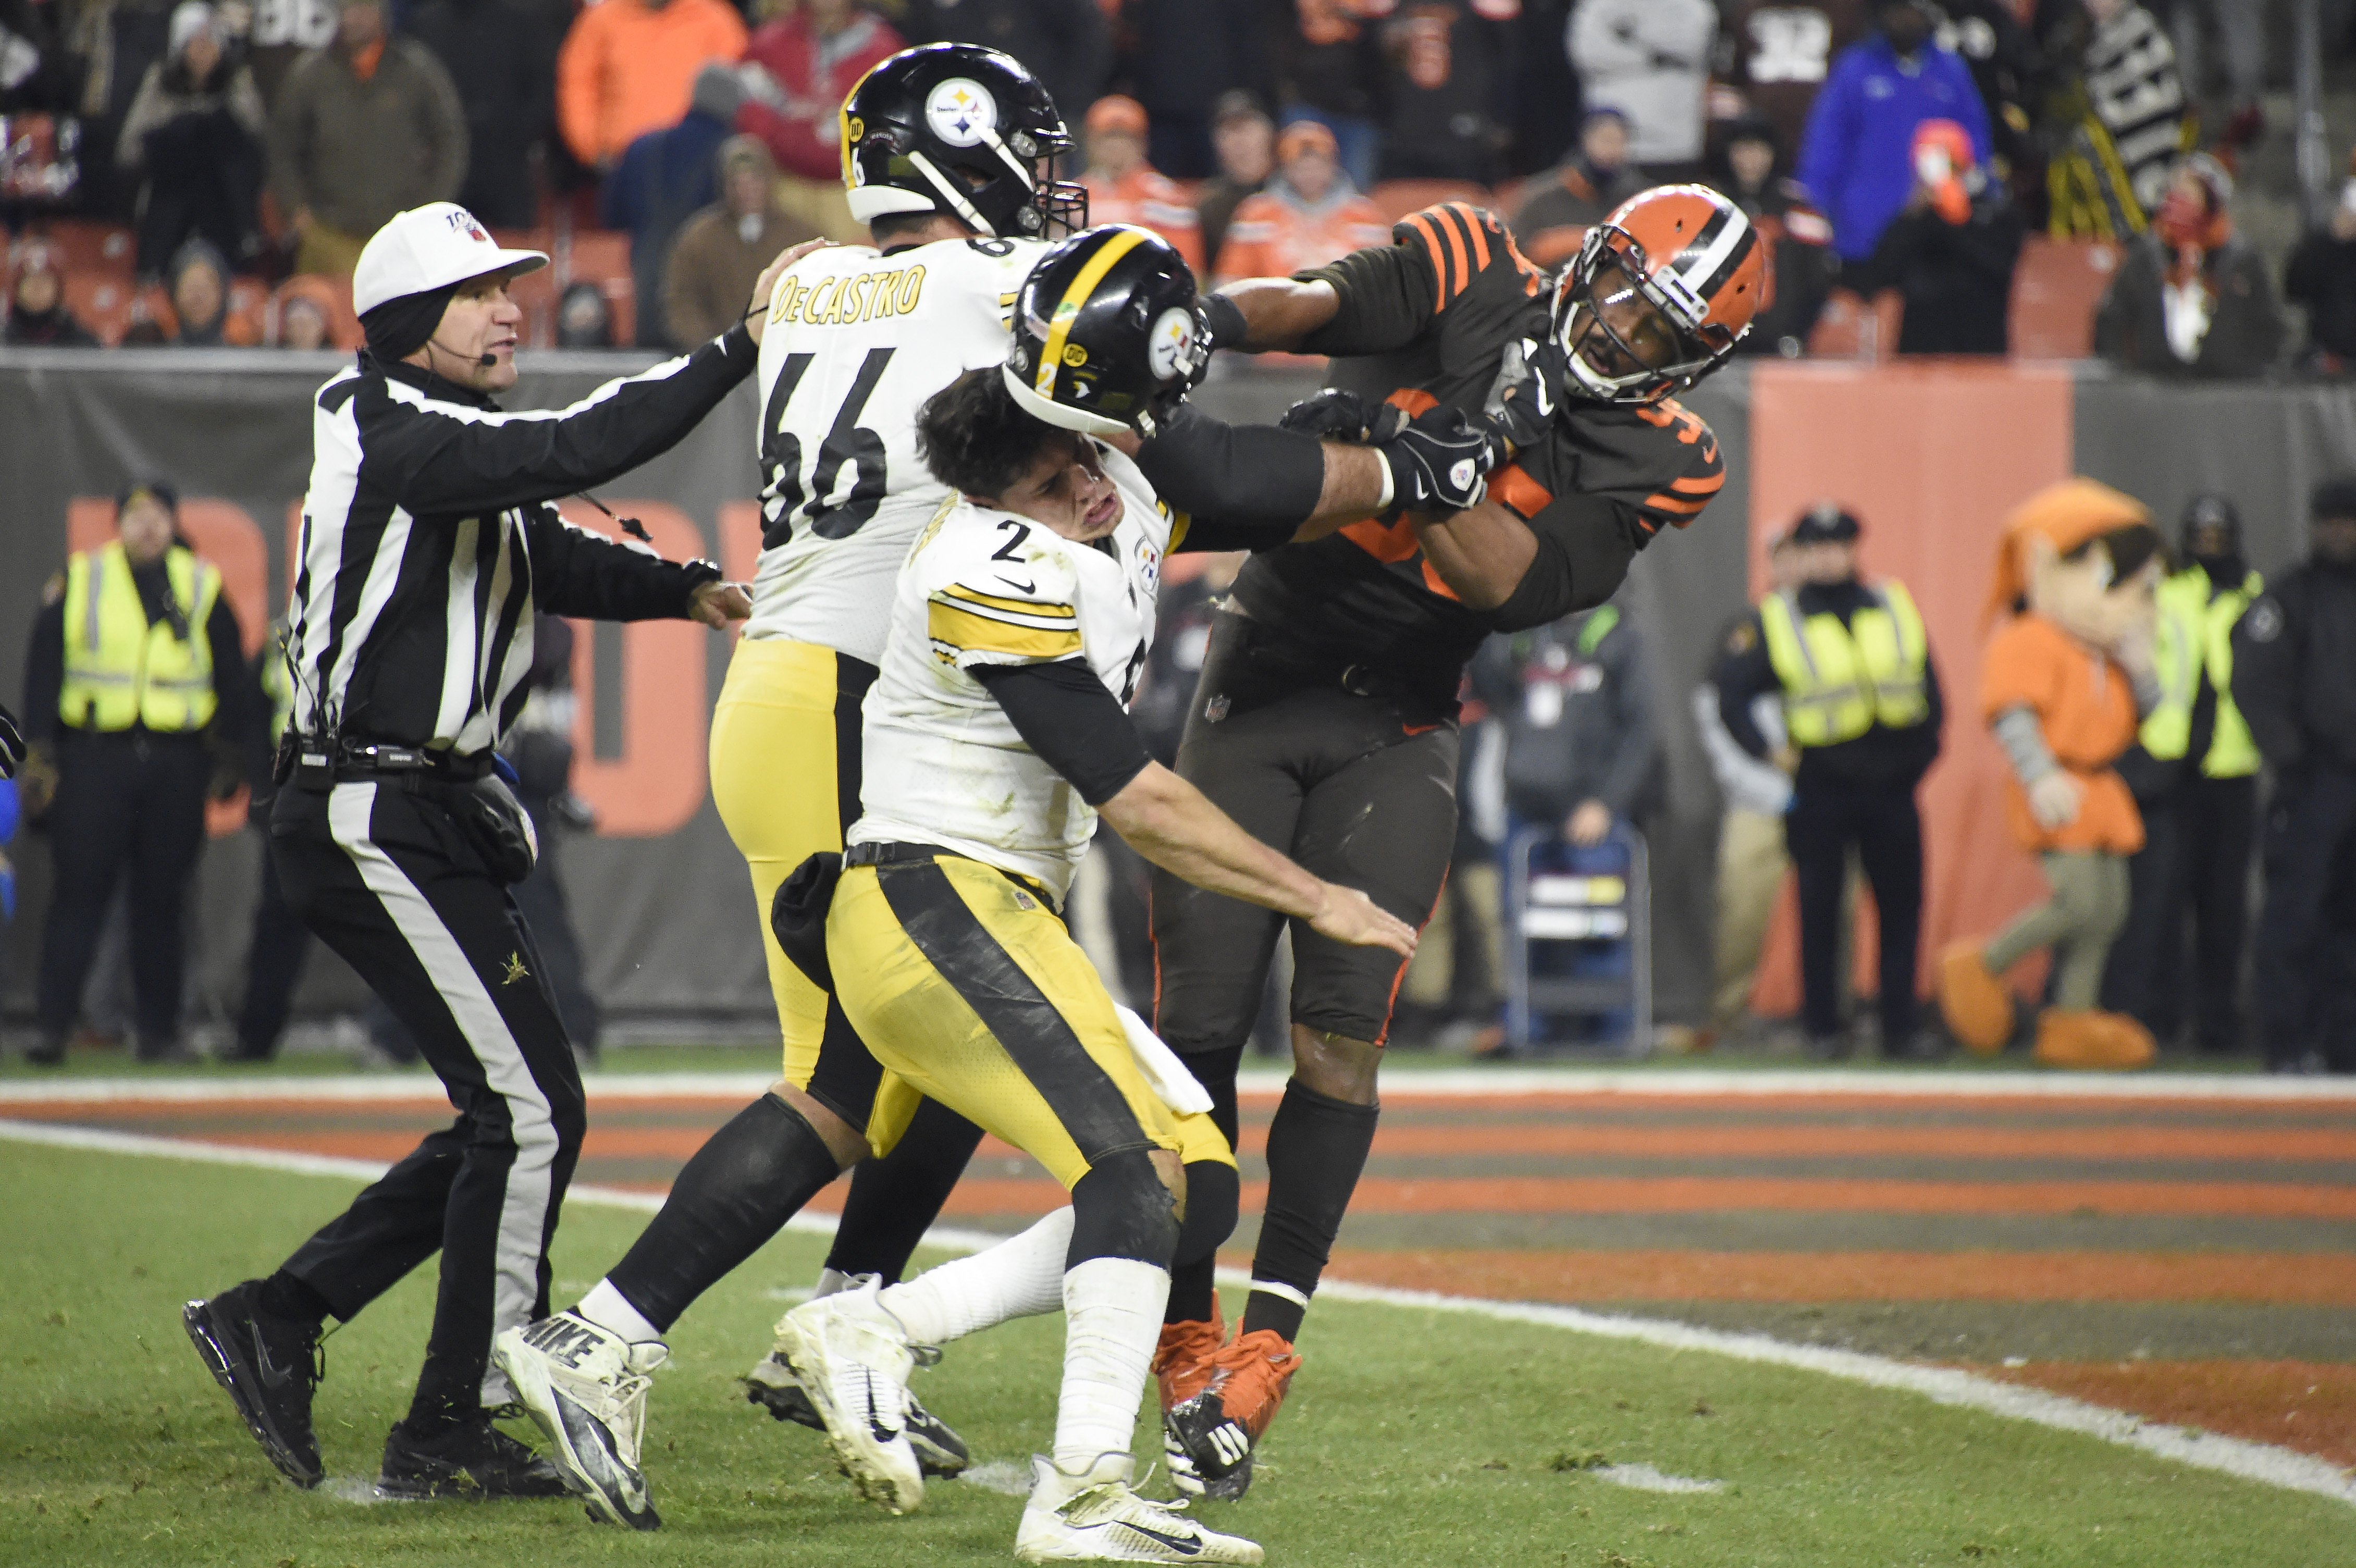 Inexcusable Browns Myles Garrett Denounced For Helmet Attack On Steelers Qb